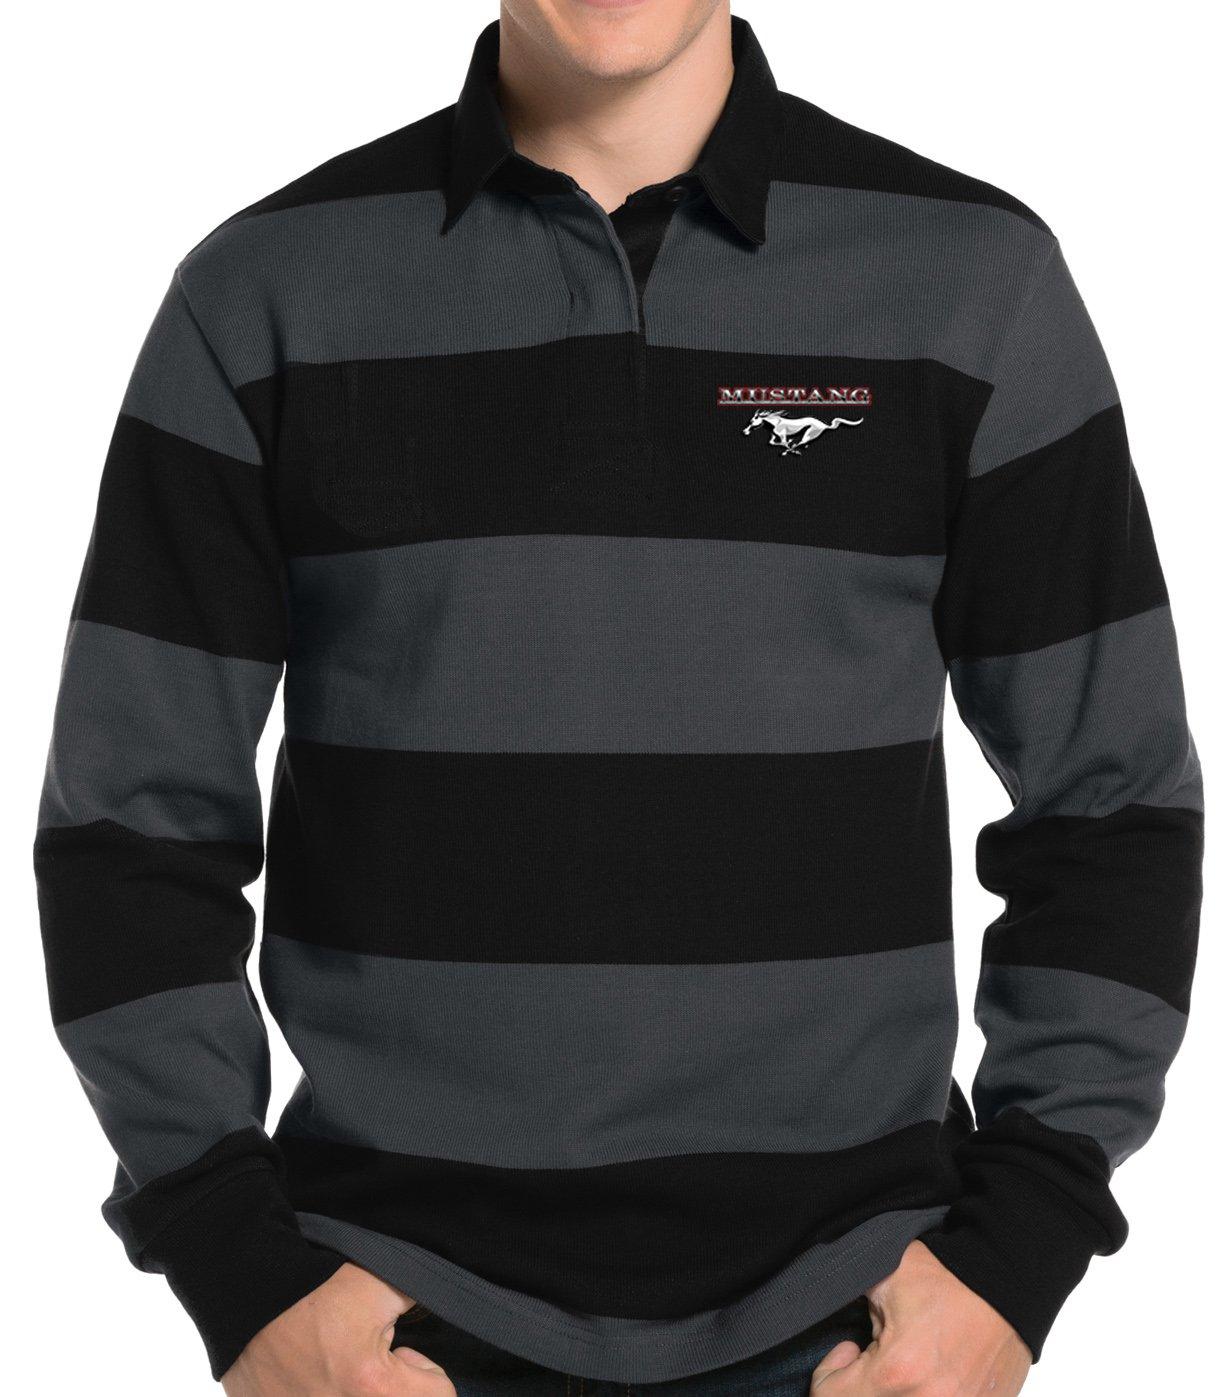 Buy Cool Shirts OUTERWEAR メンズ B076DKGPVV S|Black/Graphite Grey Black/Graphite Grey S